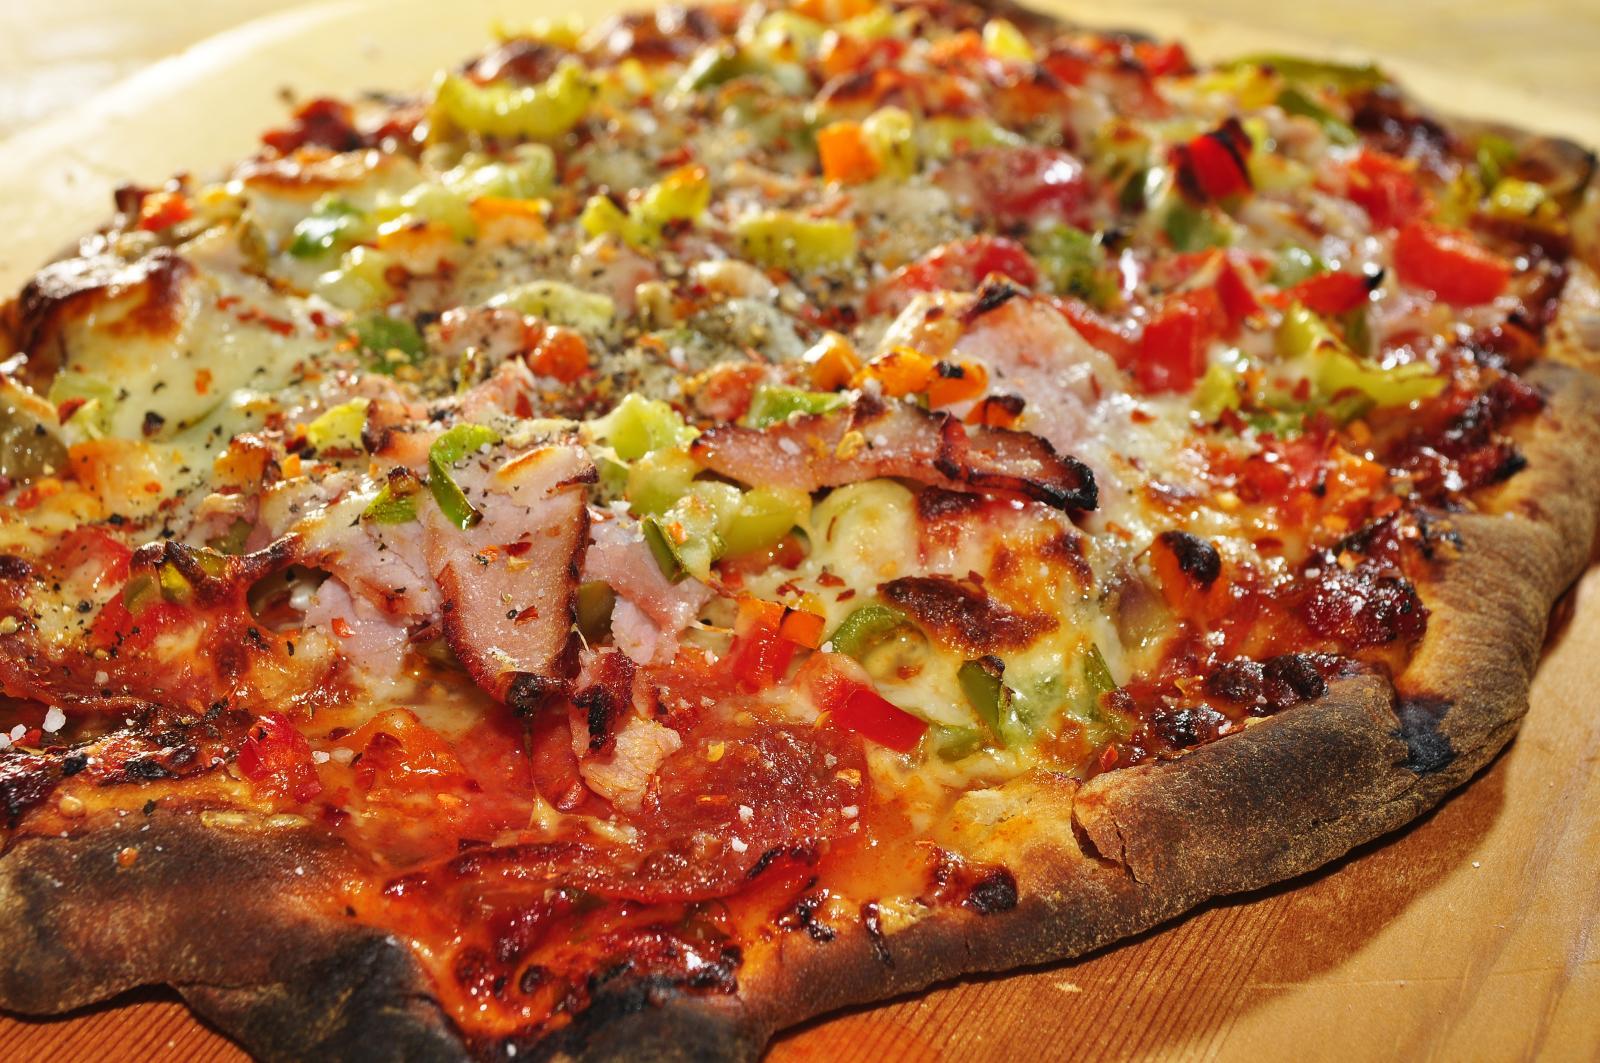 File:Homemade pizza (4).jpg - Wikimedia Commons